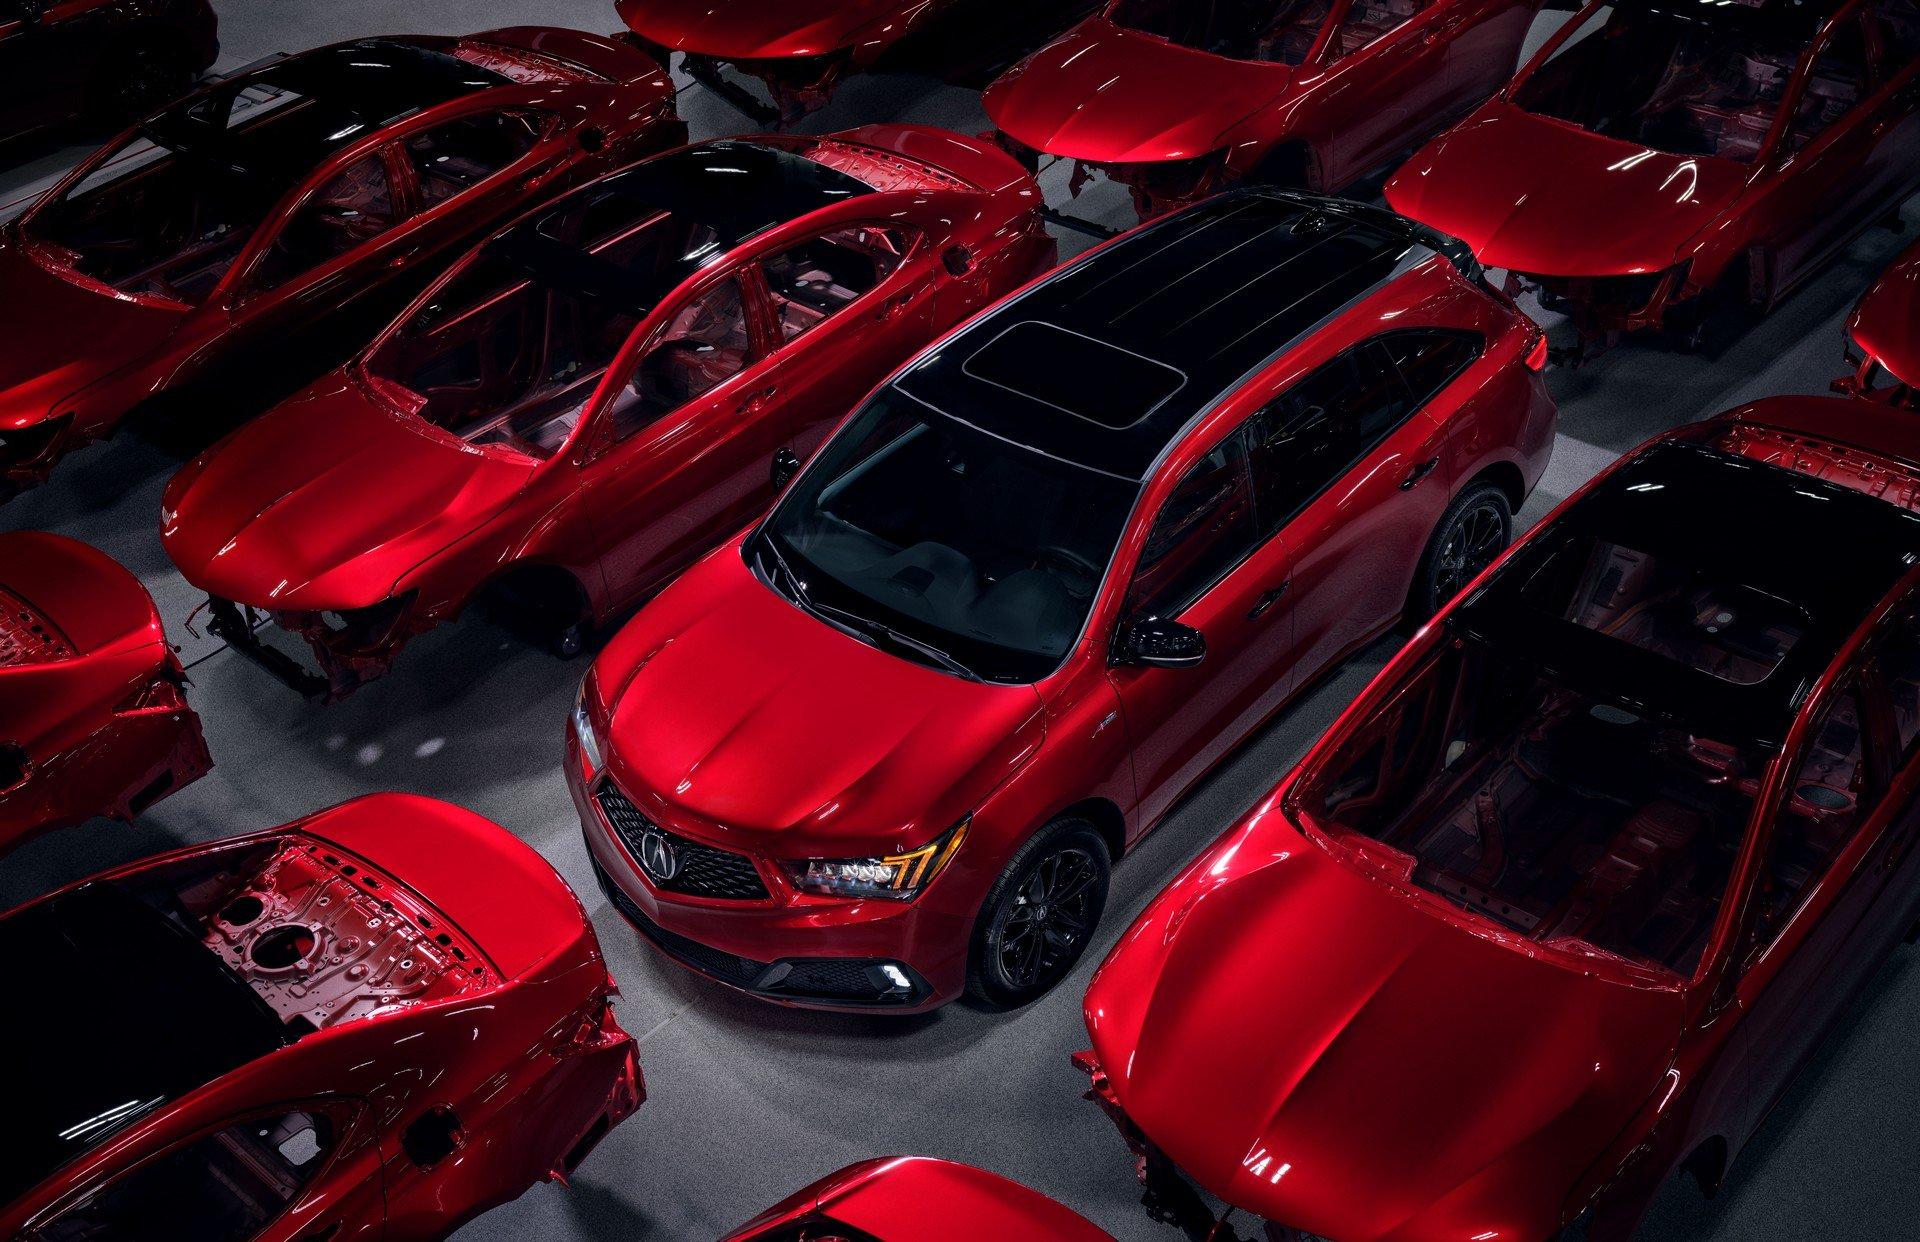 Acura-MDX-PMC-Edition-9